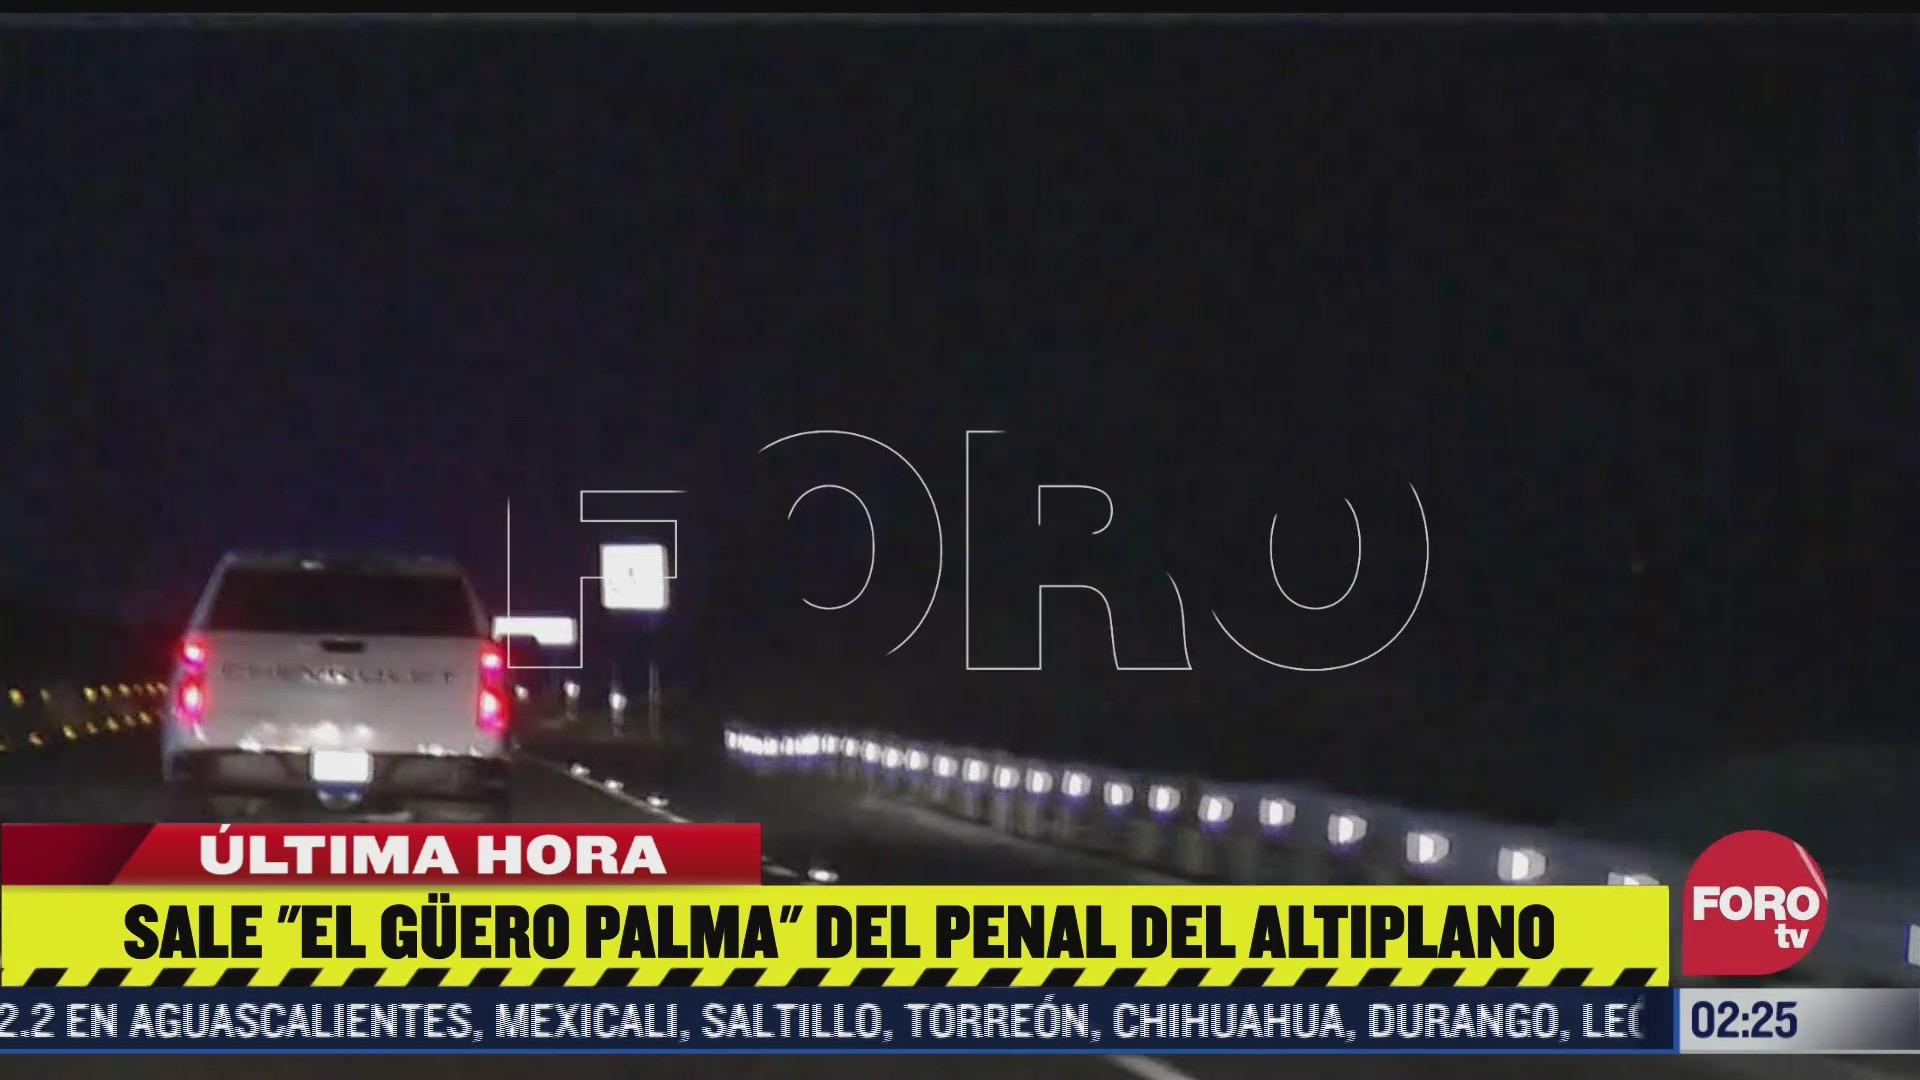 'El Güero Palma' sale del Penal del Altiplano